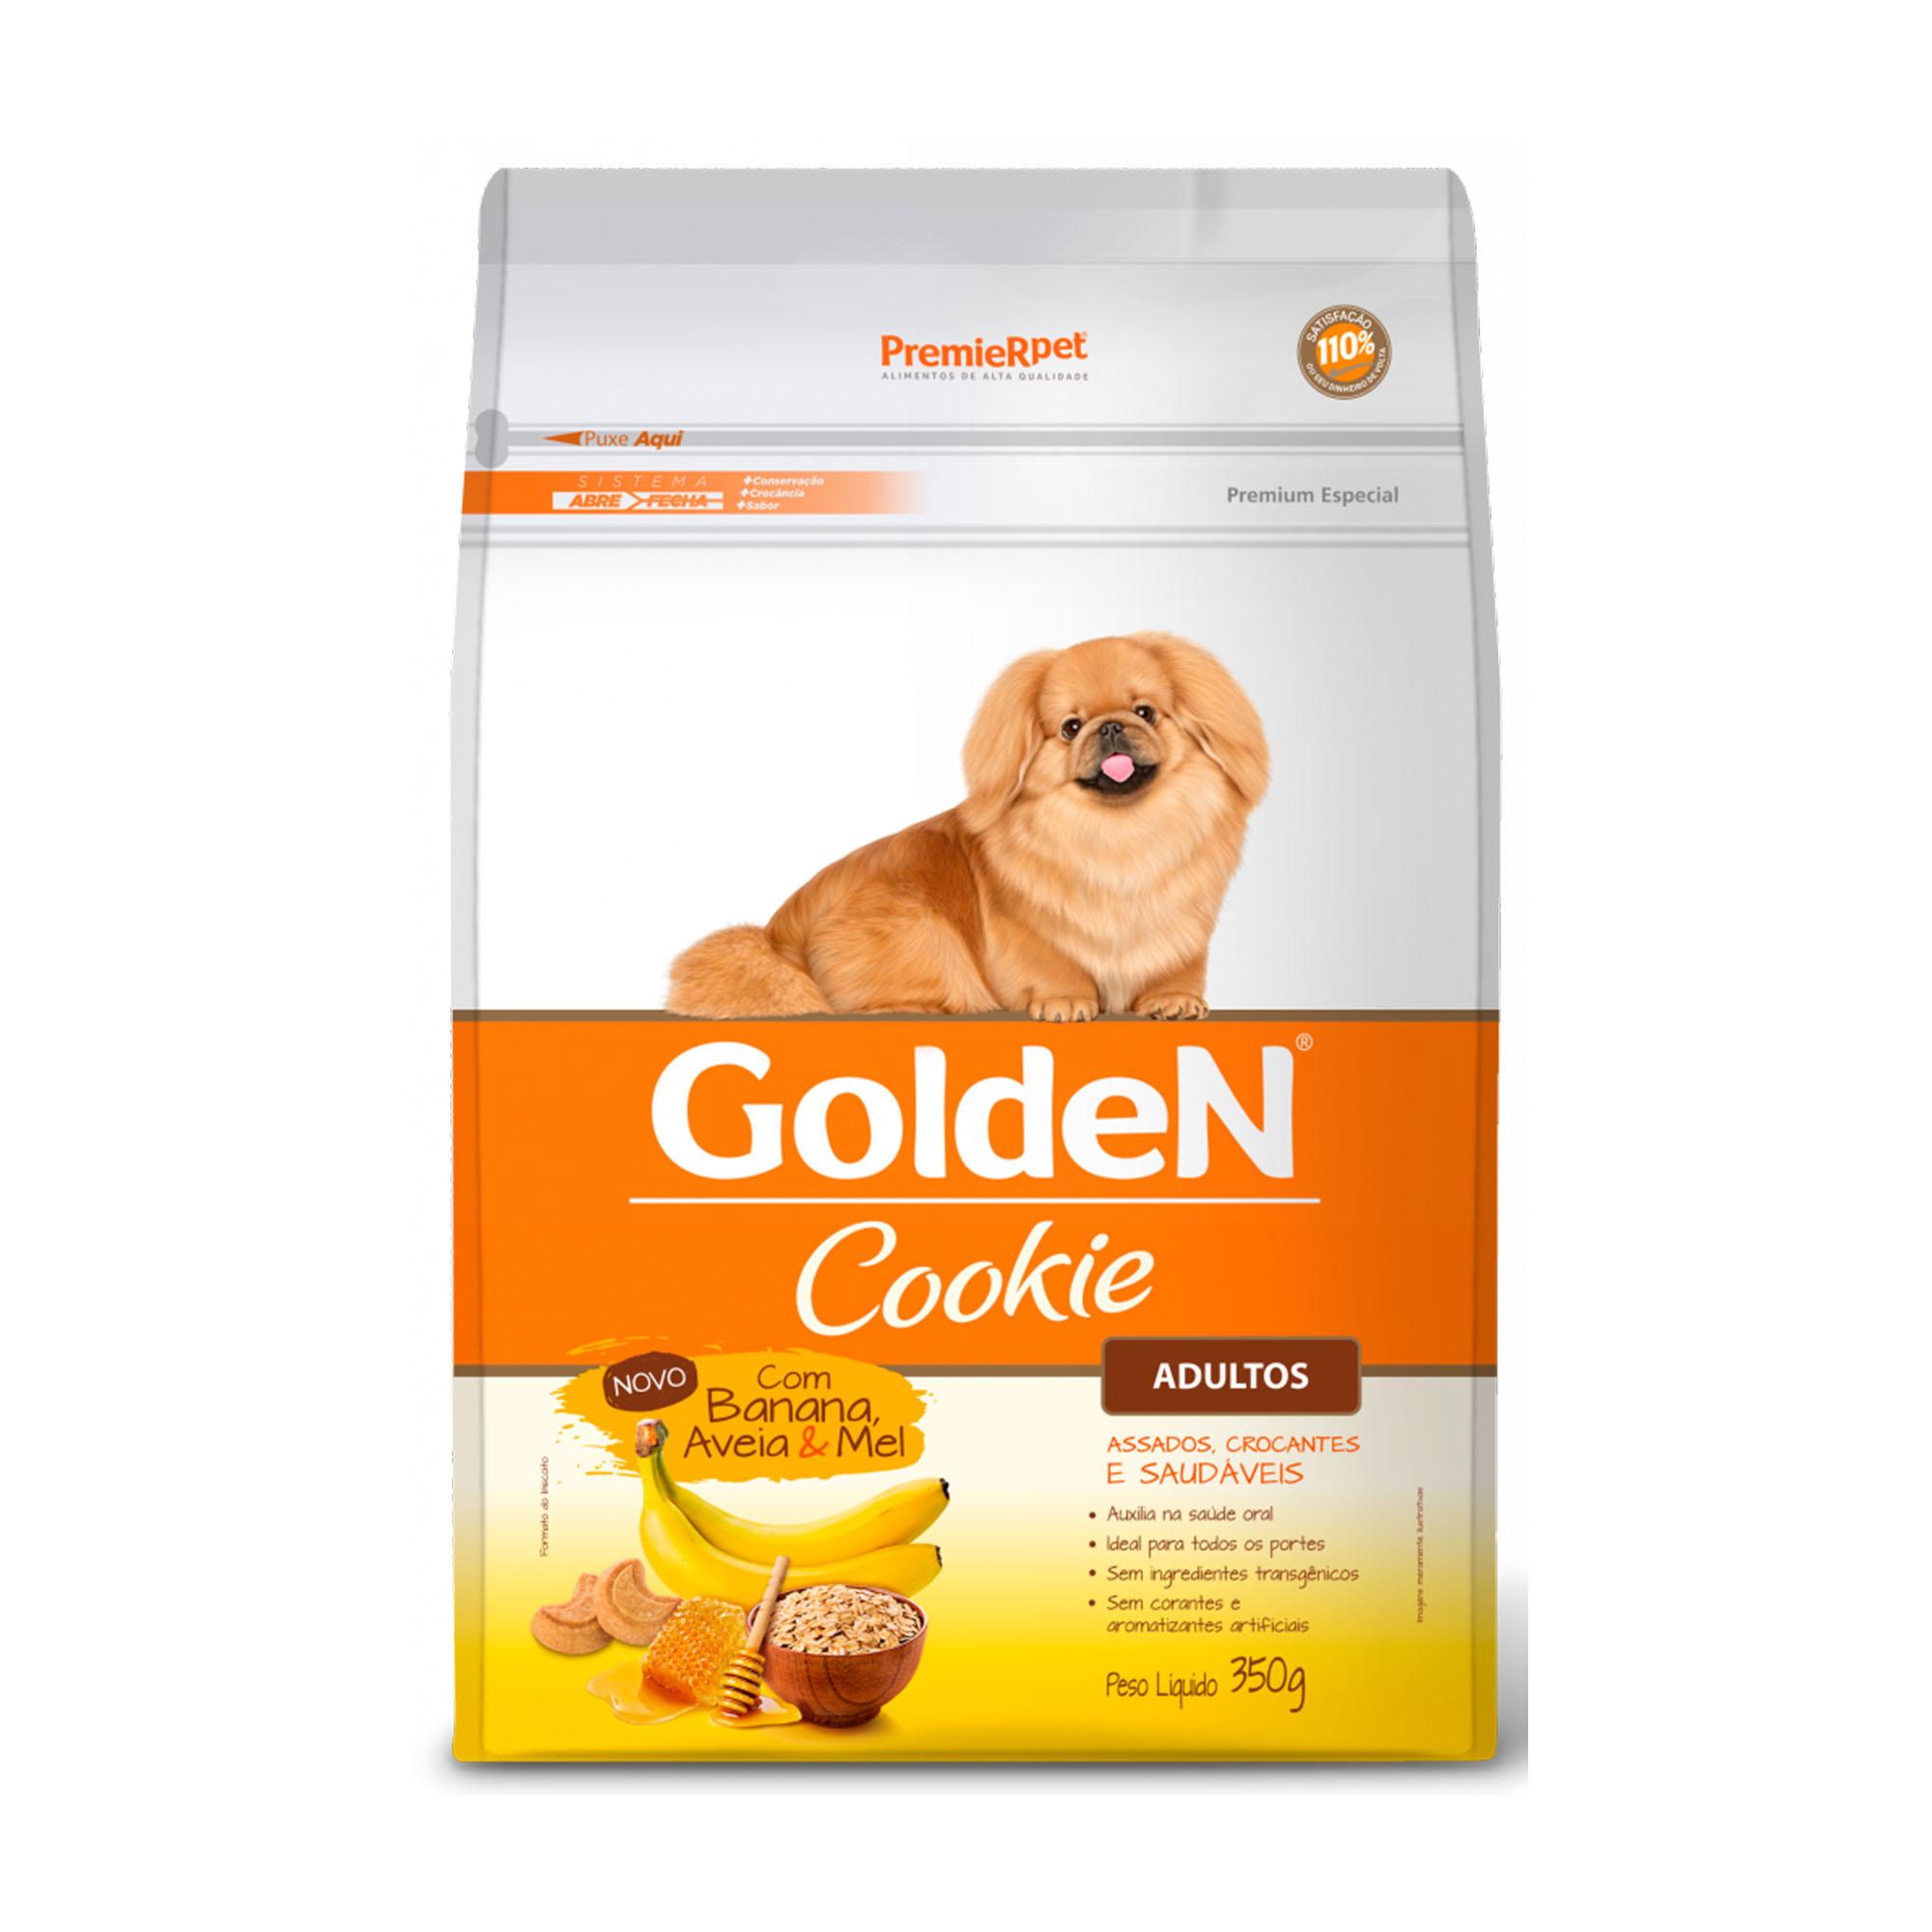 Golden Cookie Cães Adultos Banana, Aveia & Mel 350g